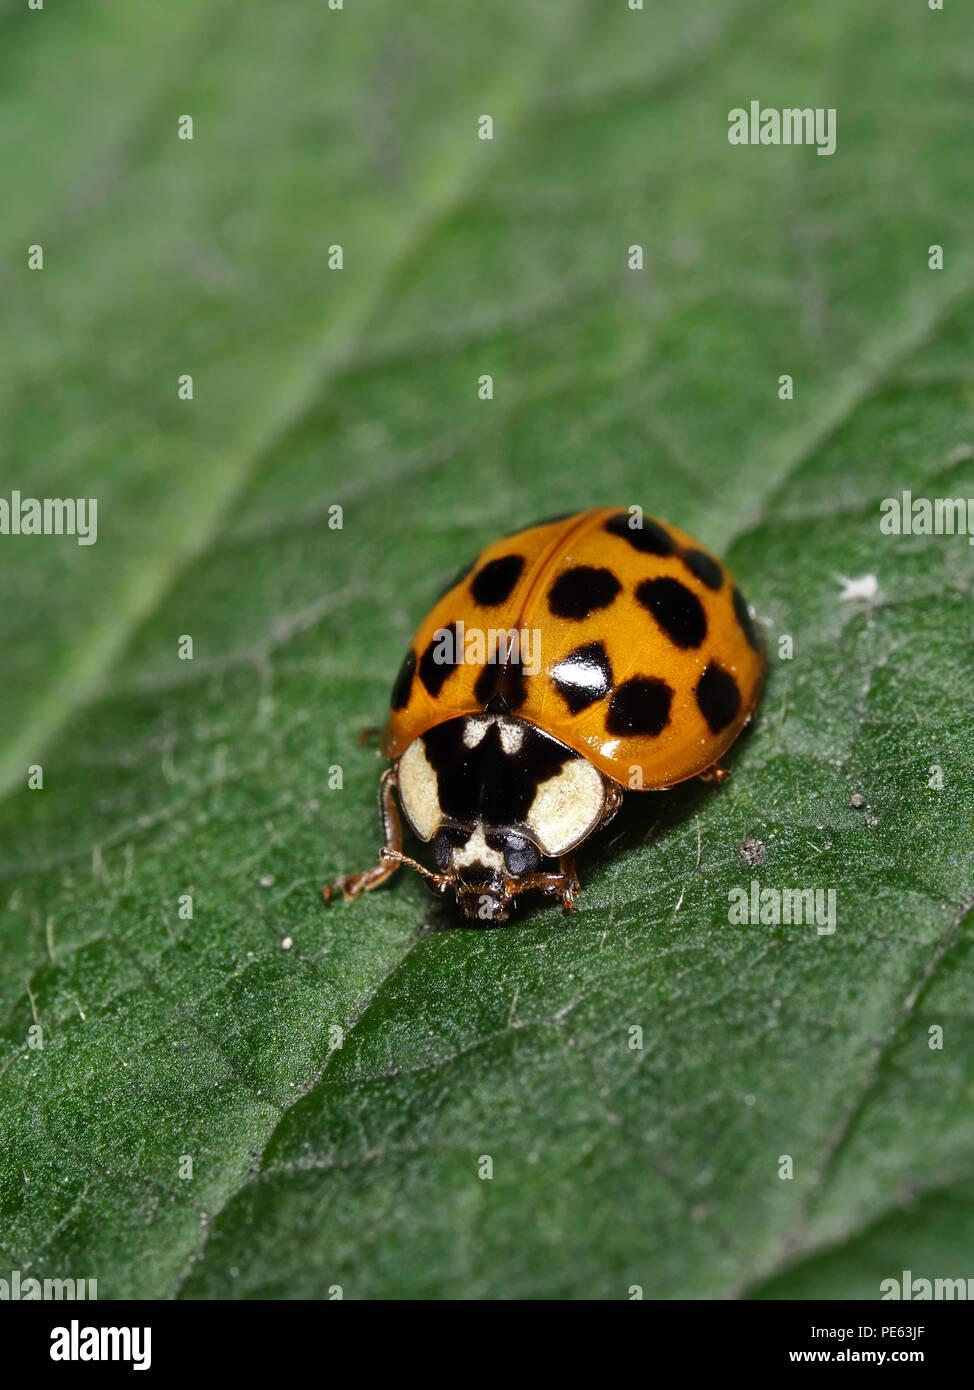 Asian ladybeetle - Harmonia axyridis Stock Photo